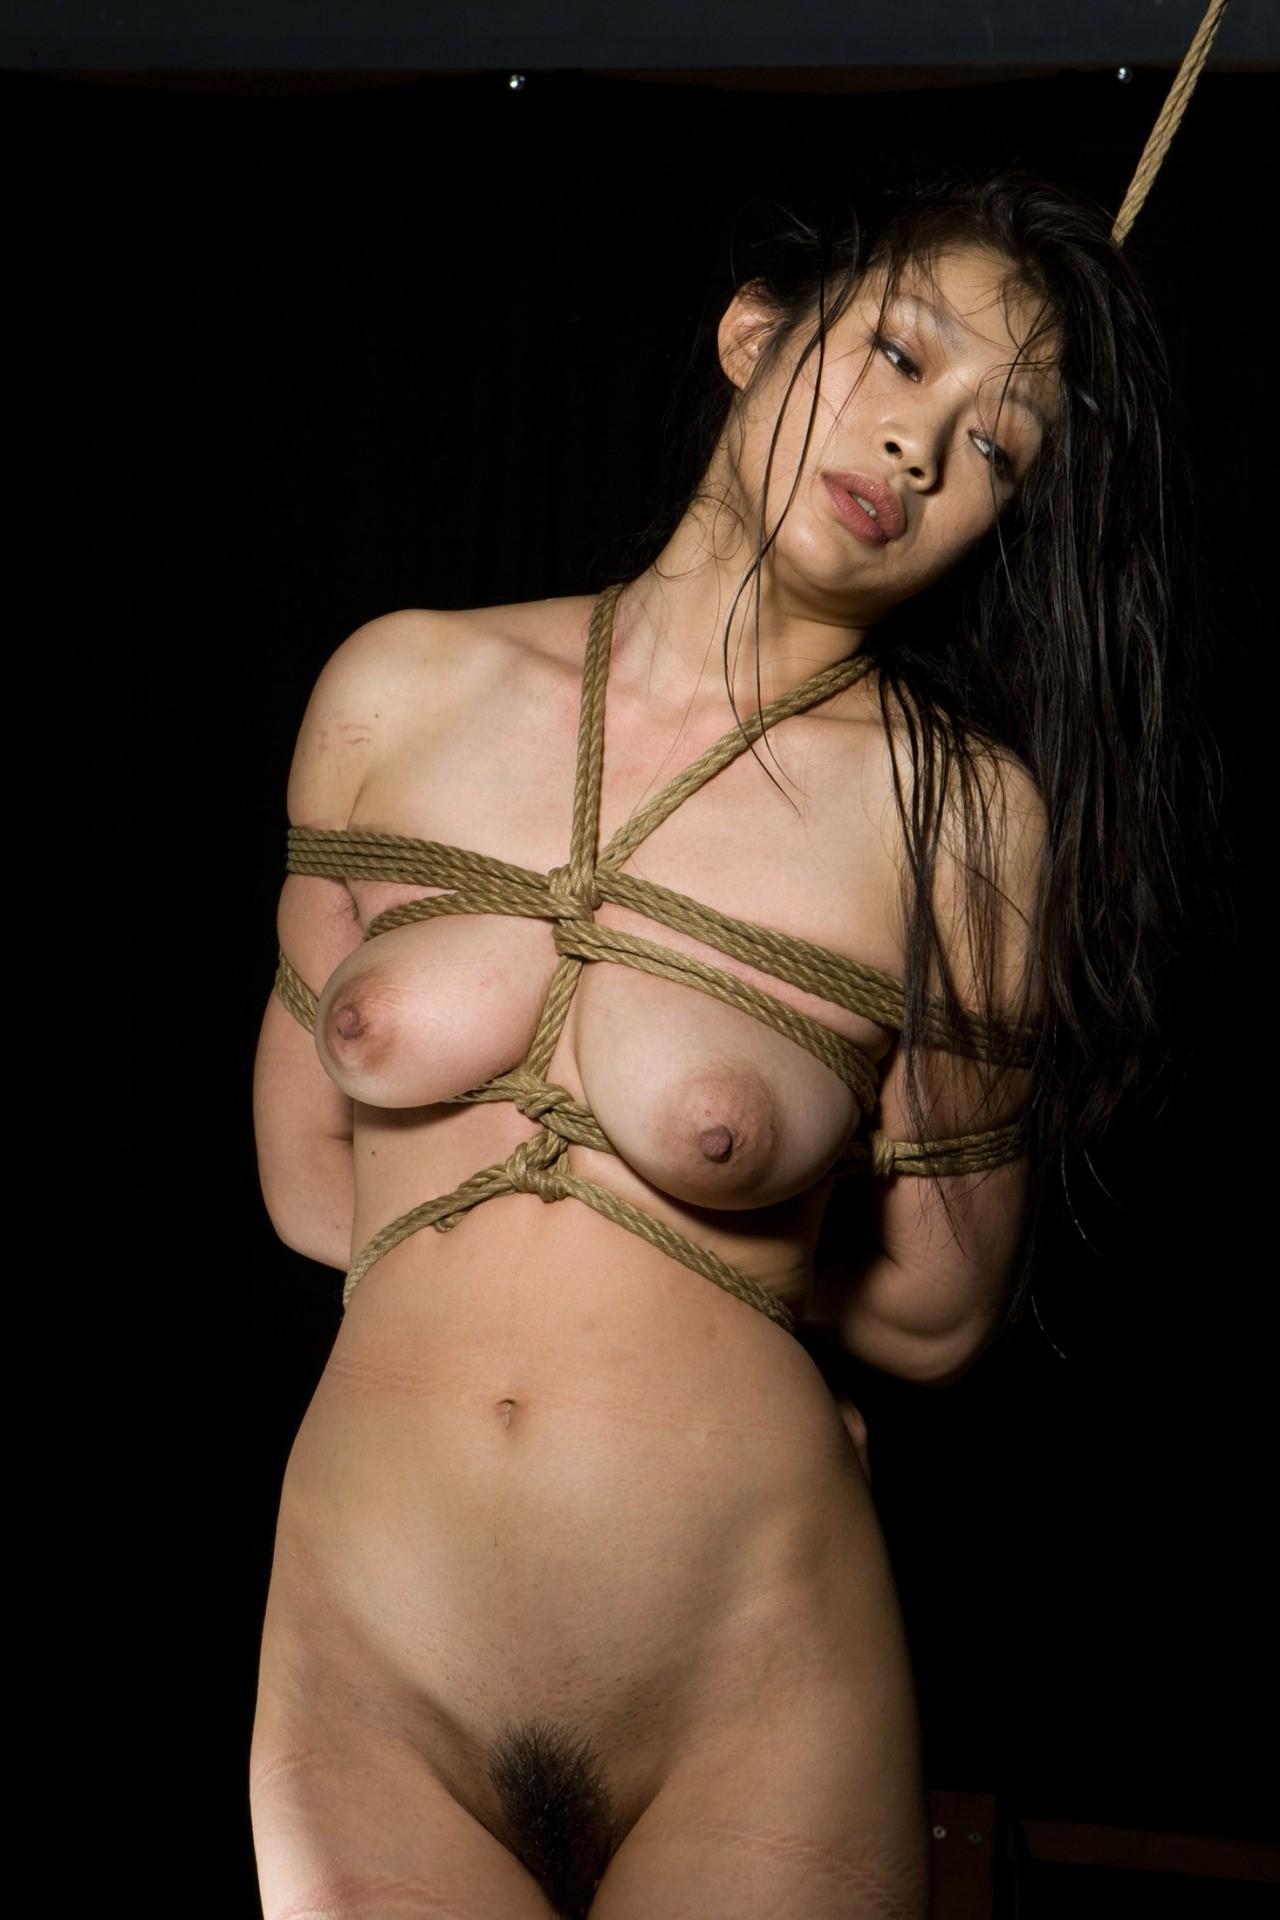 tumblr 緊縛蔵 完全無修正 【SMエロ画像】解くの勿体ないほど卑猥で芸術的な女体緊縛